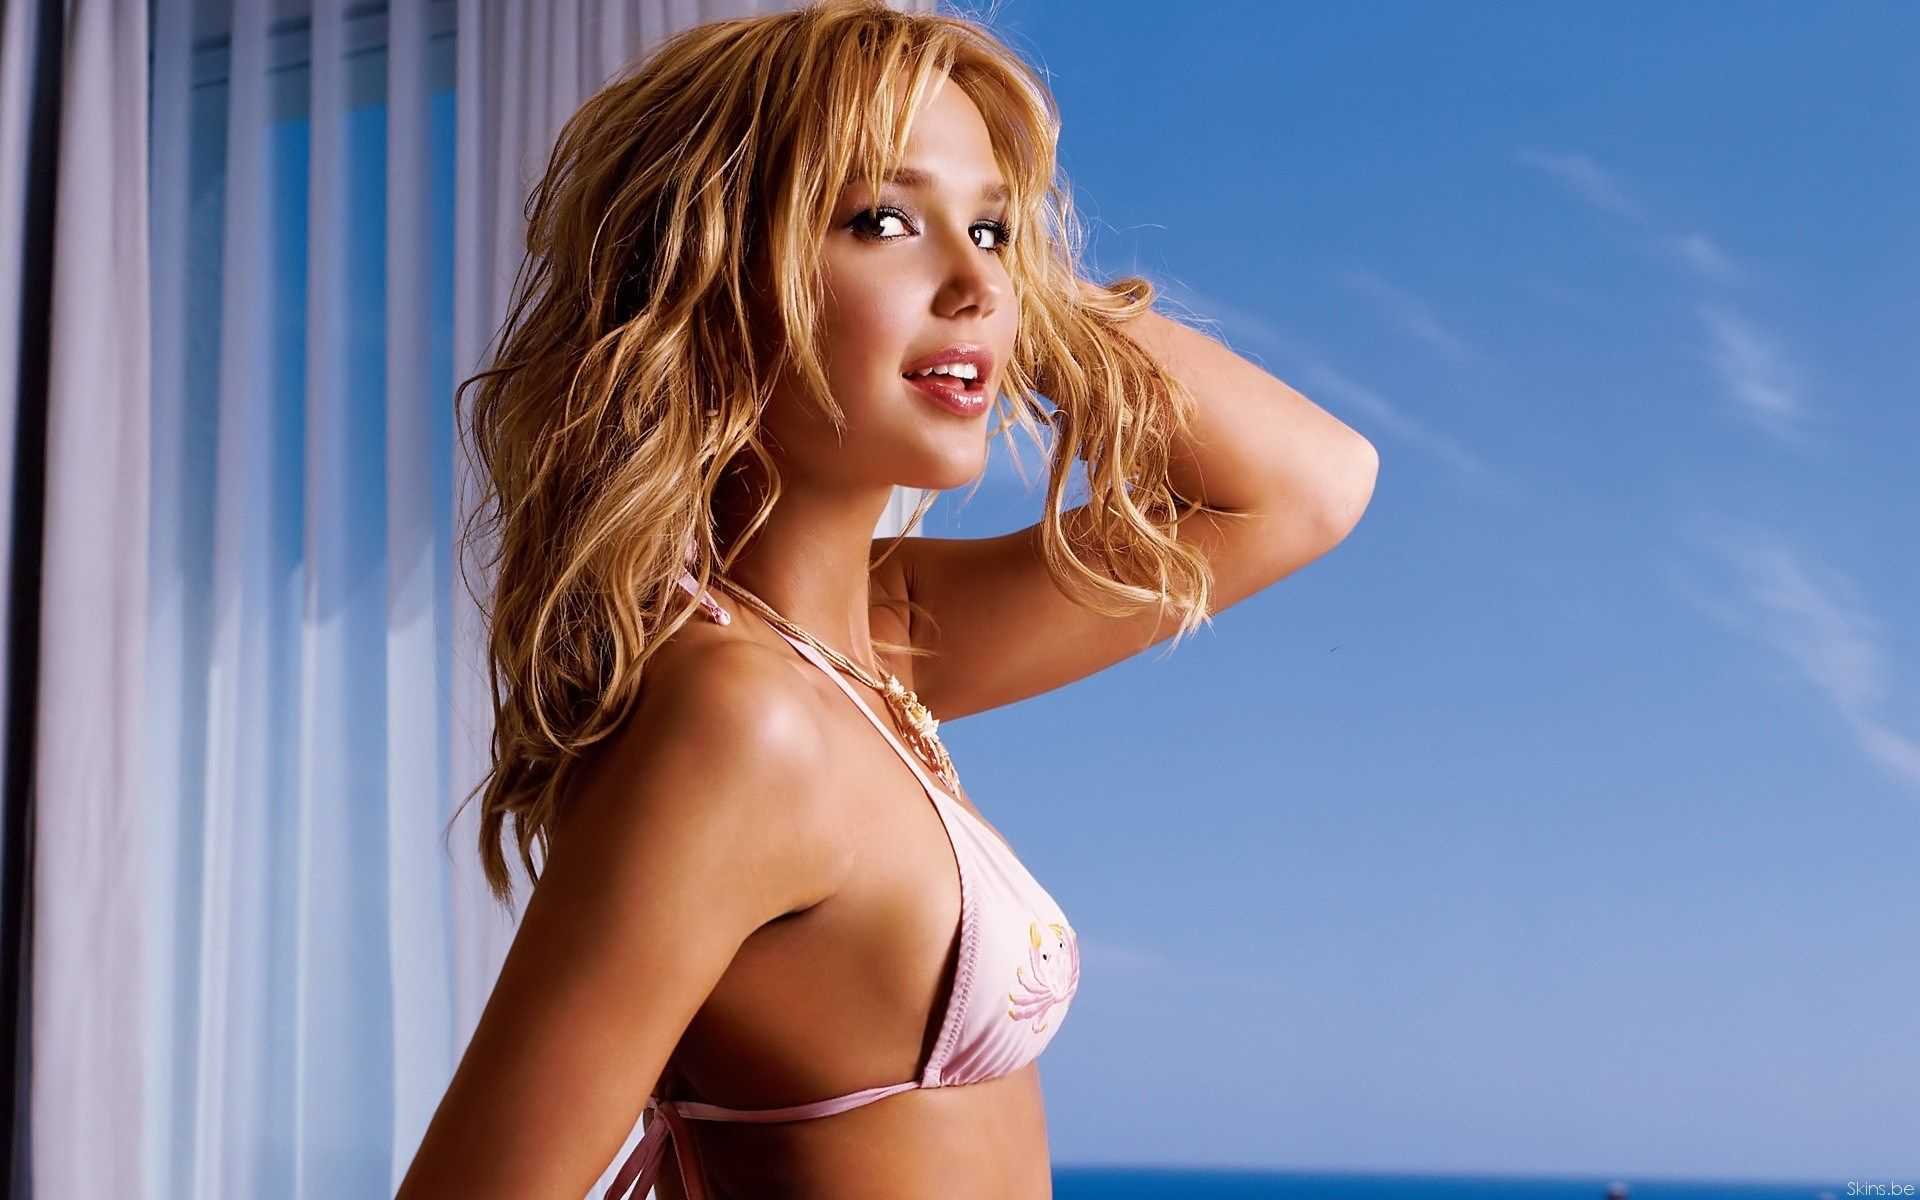 Bikini model screensaver